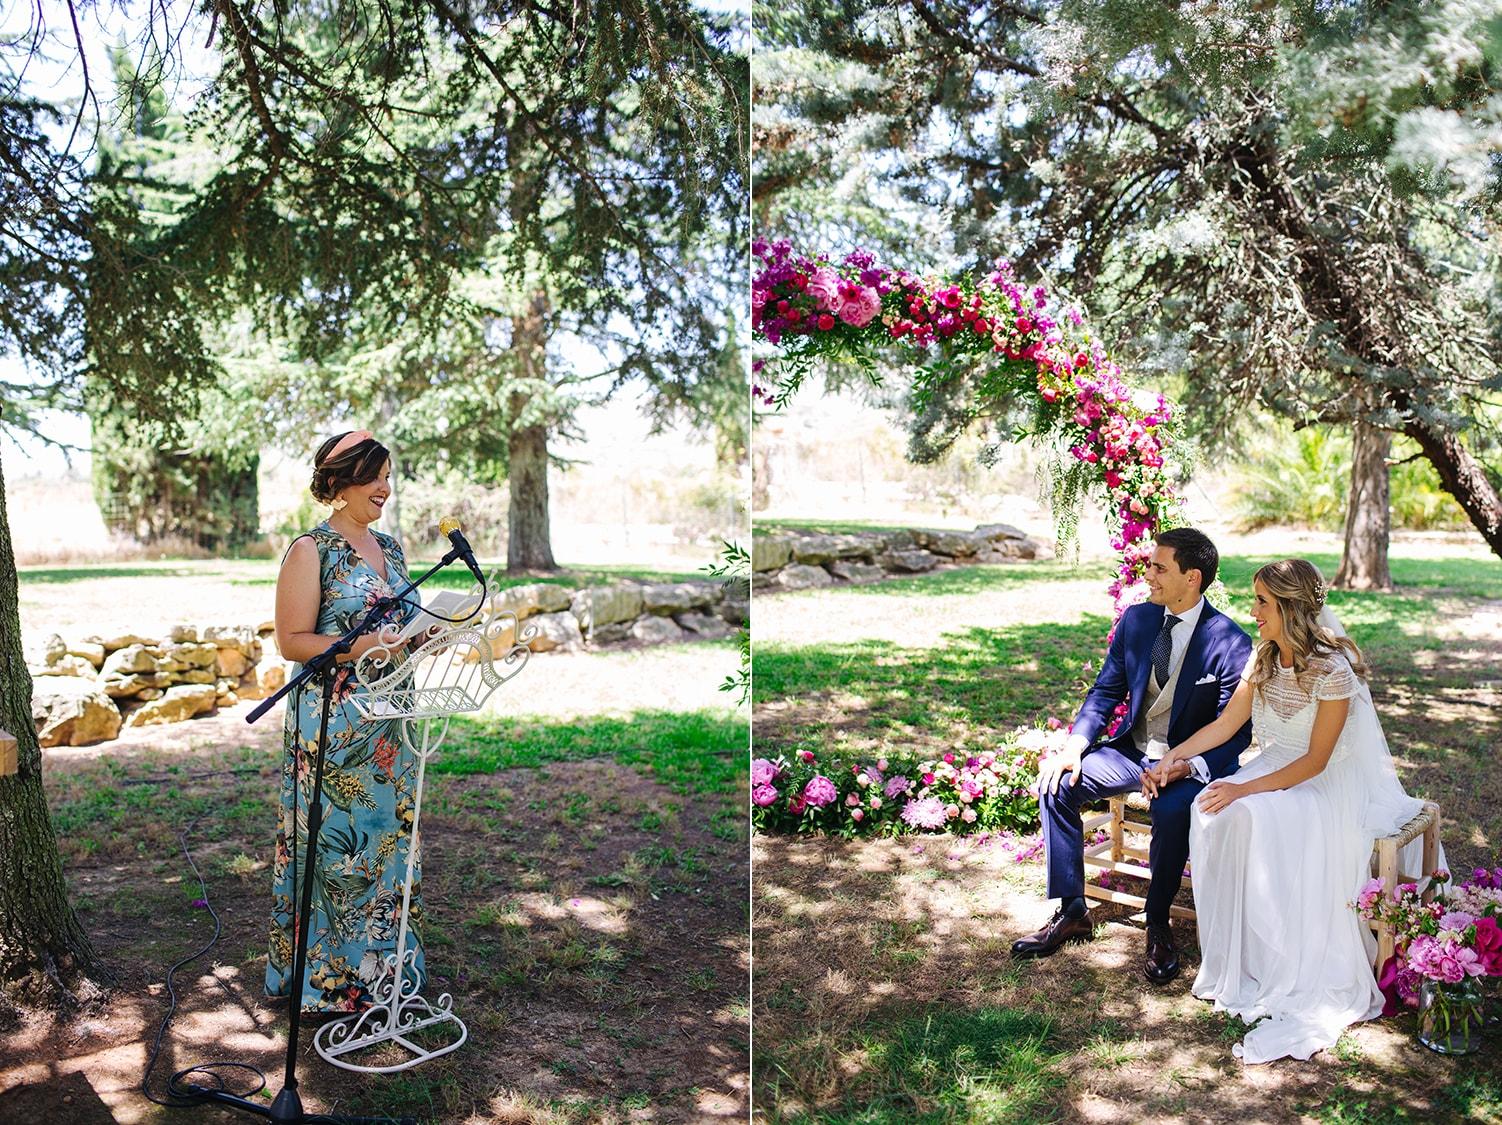 paulagfurio_bouganvillea_wedding_spain_017.jpg